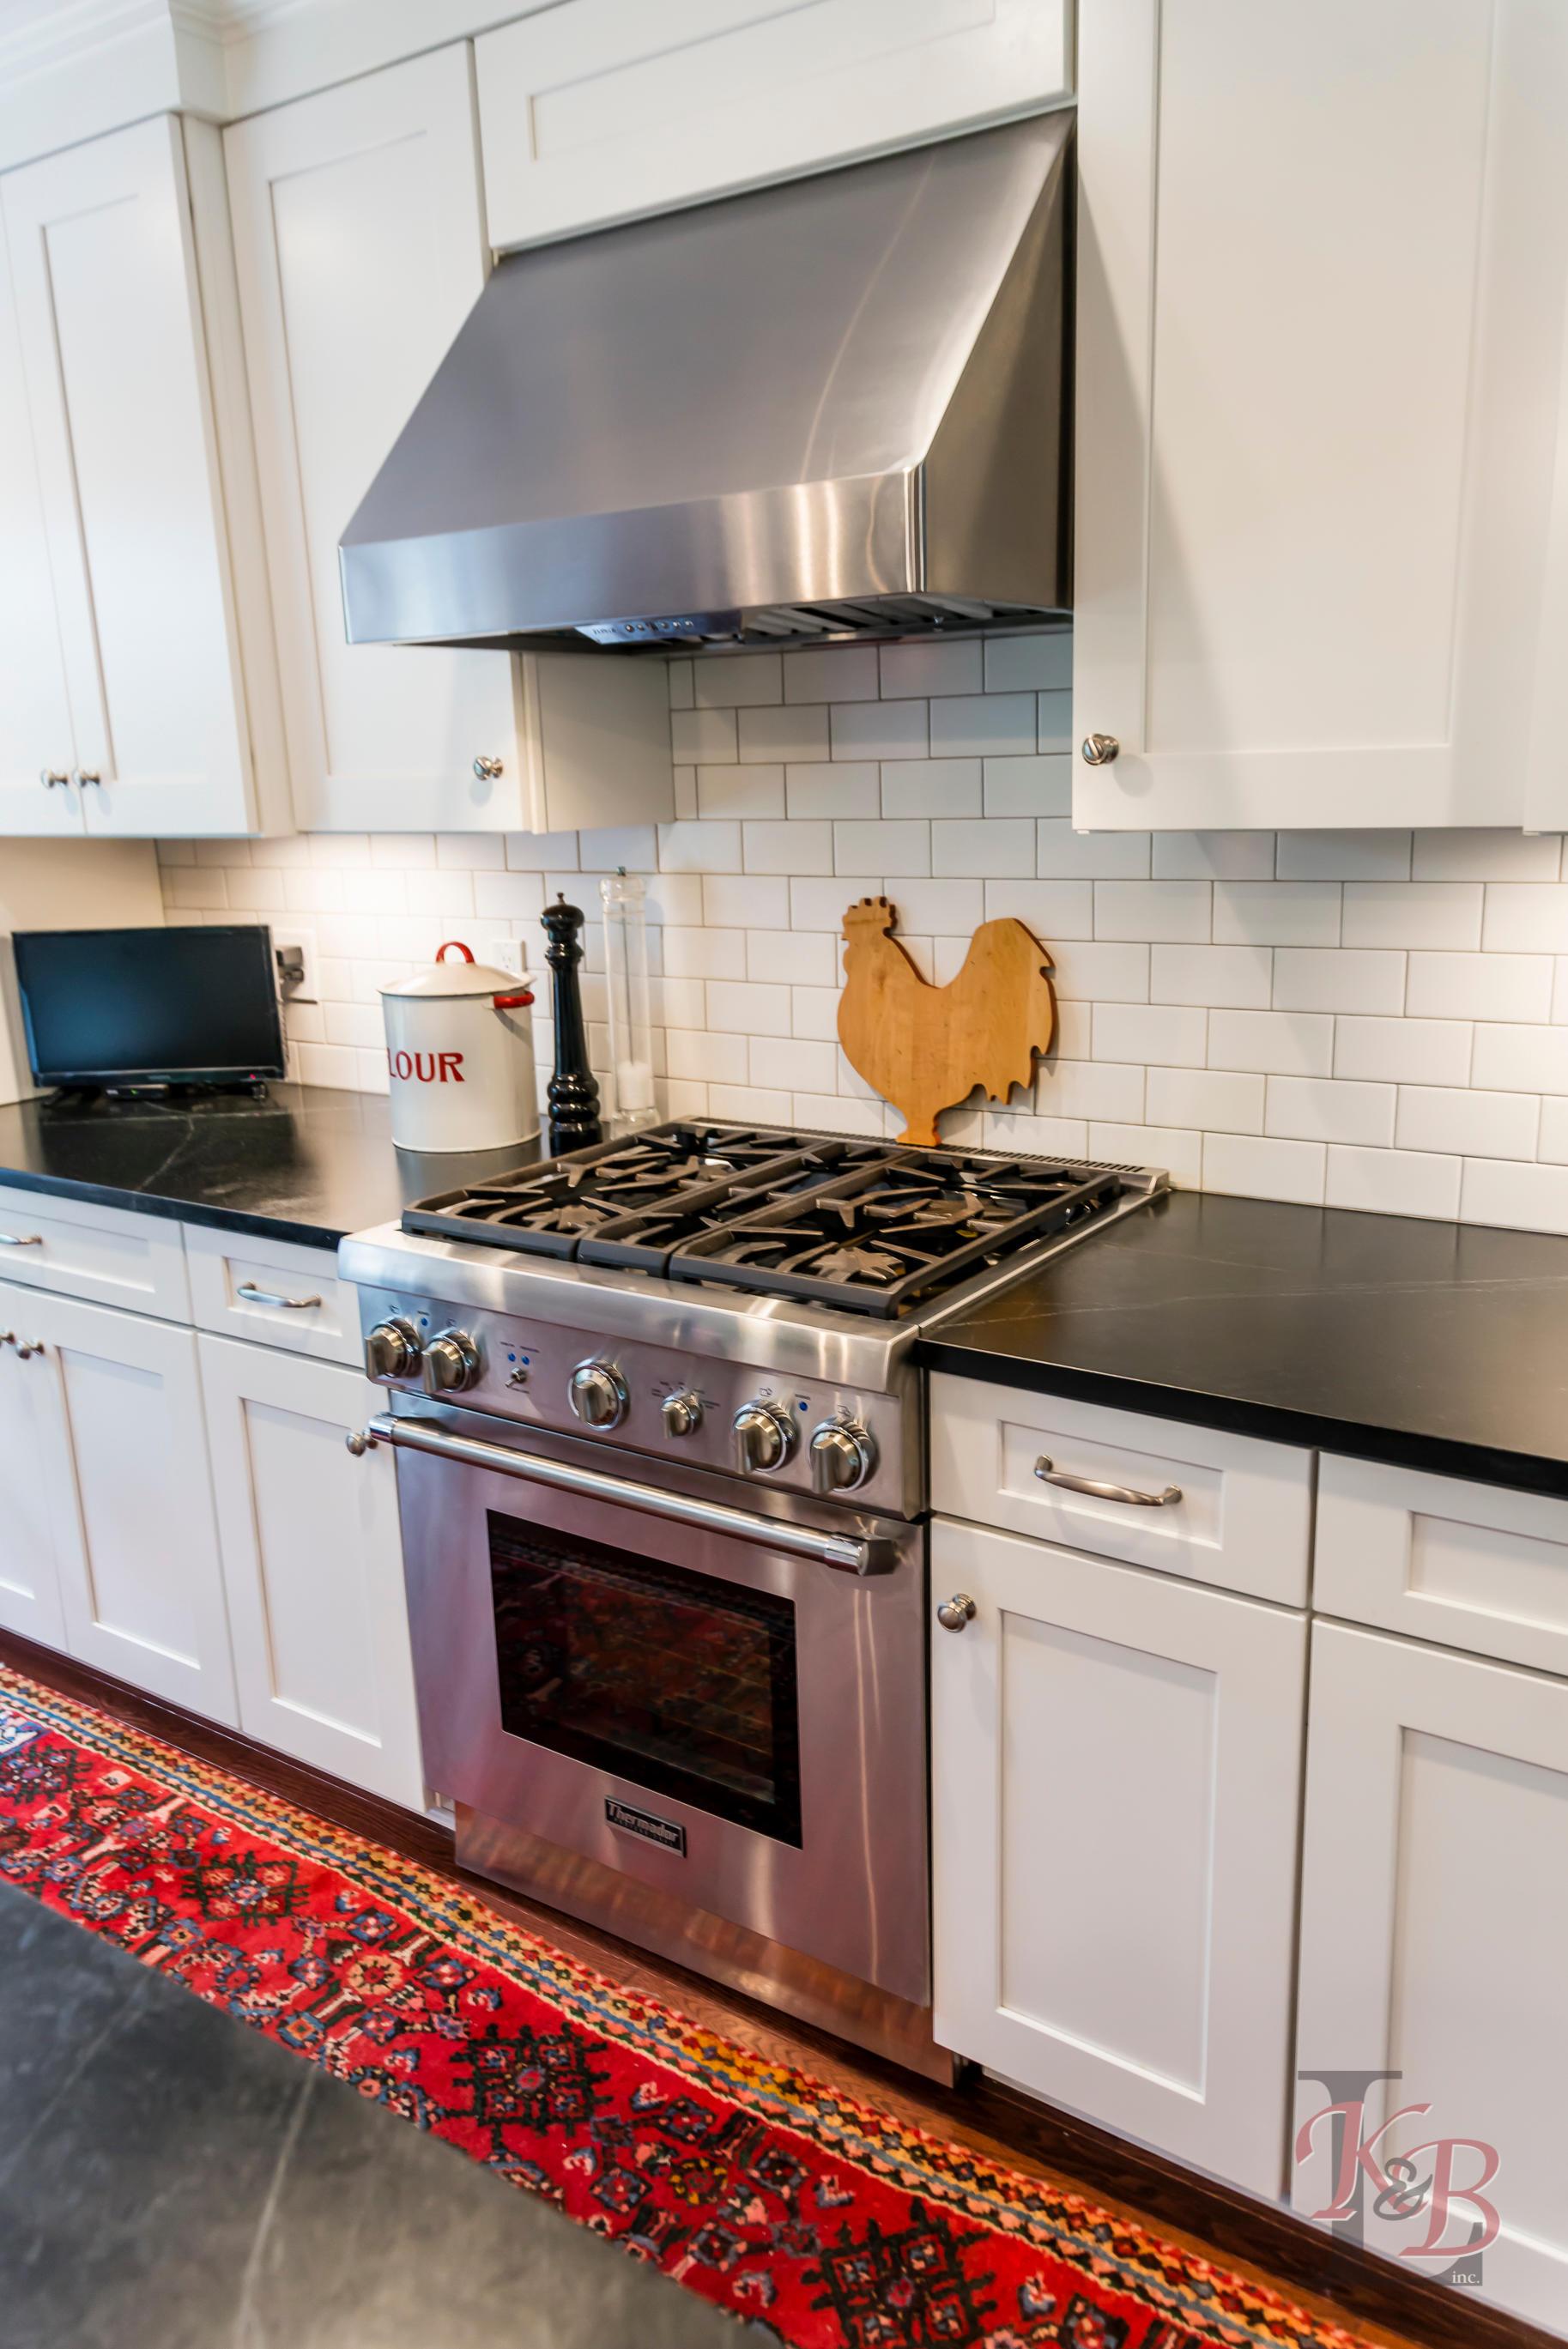 Linden Kitchen & Bath, Inc. image 3